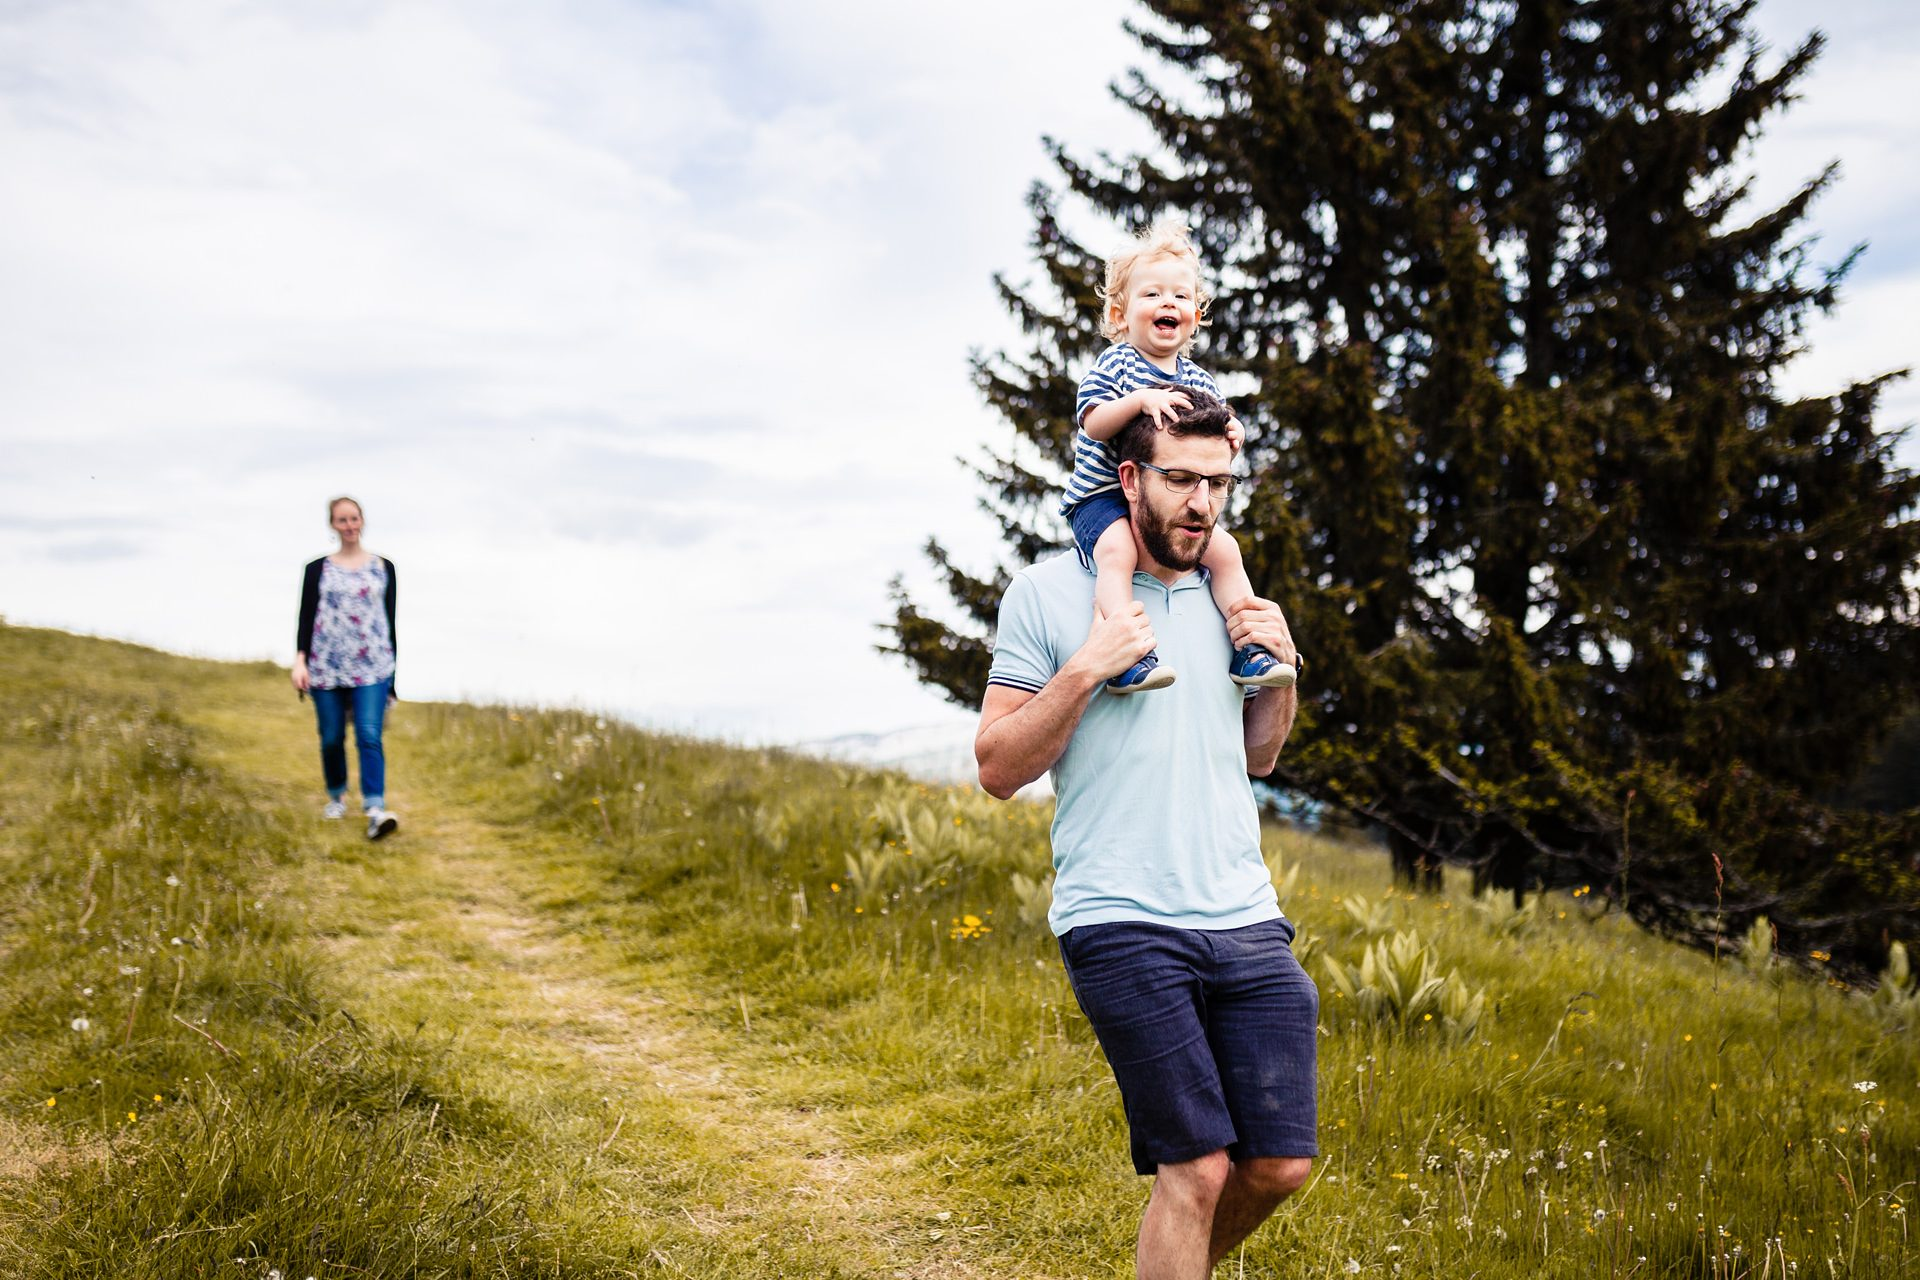 Séance photo lifestyle famille - Matthieu Chandelier photographe chambery